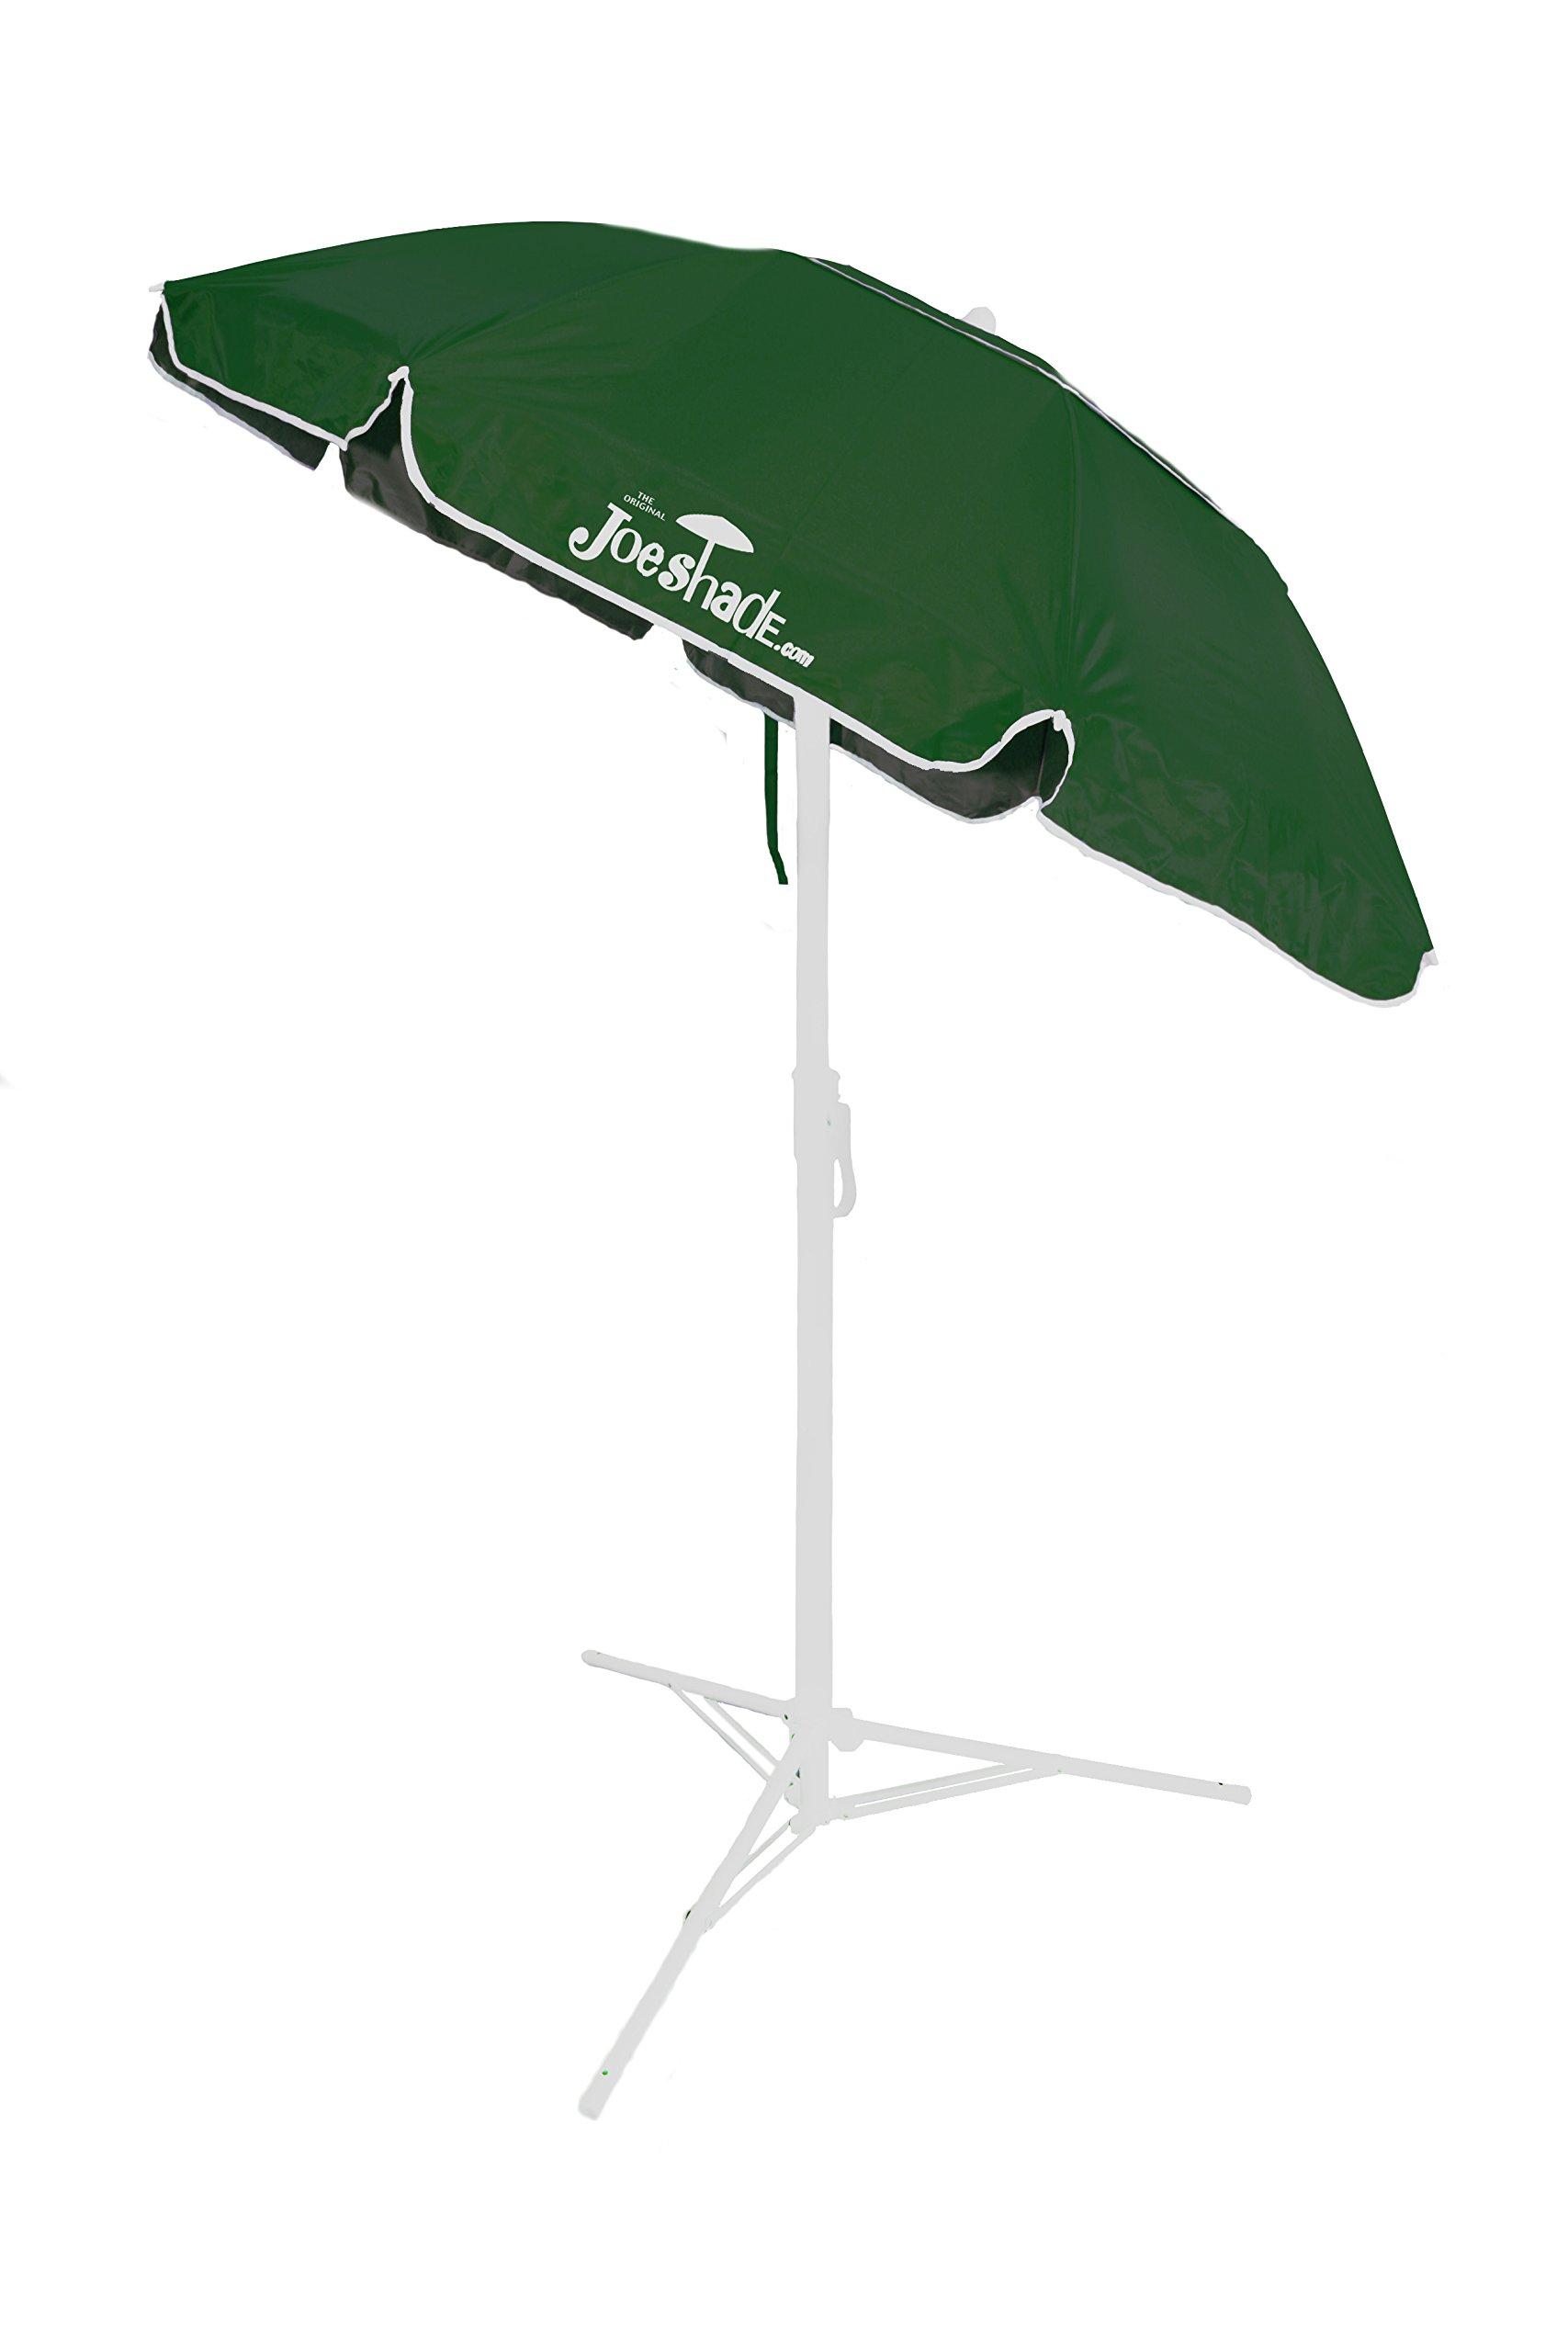 The Original JoeShade JoeShade, Portable Sun Shade Umbrella, Sunshade Umbrella, Sports Umbrella, GREEN by The Original JoeShade